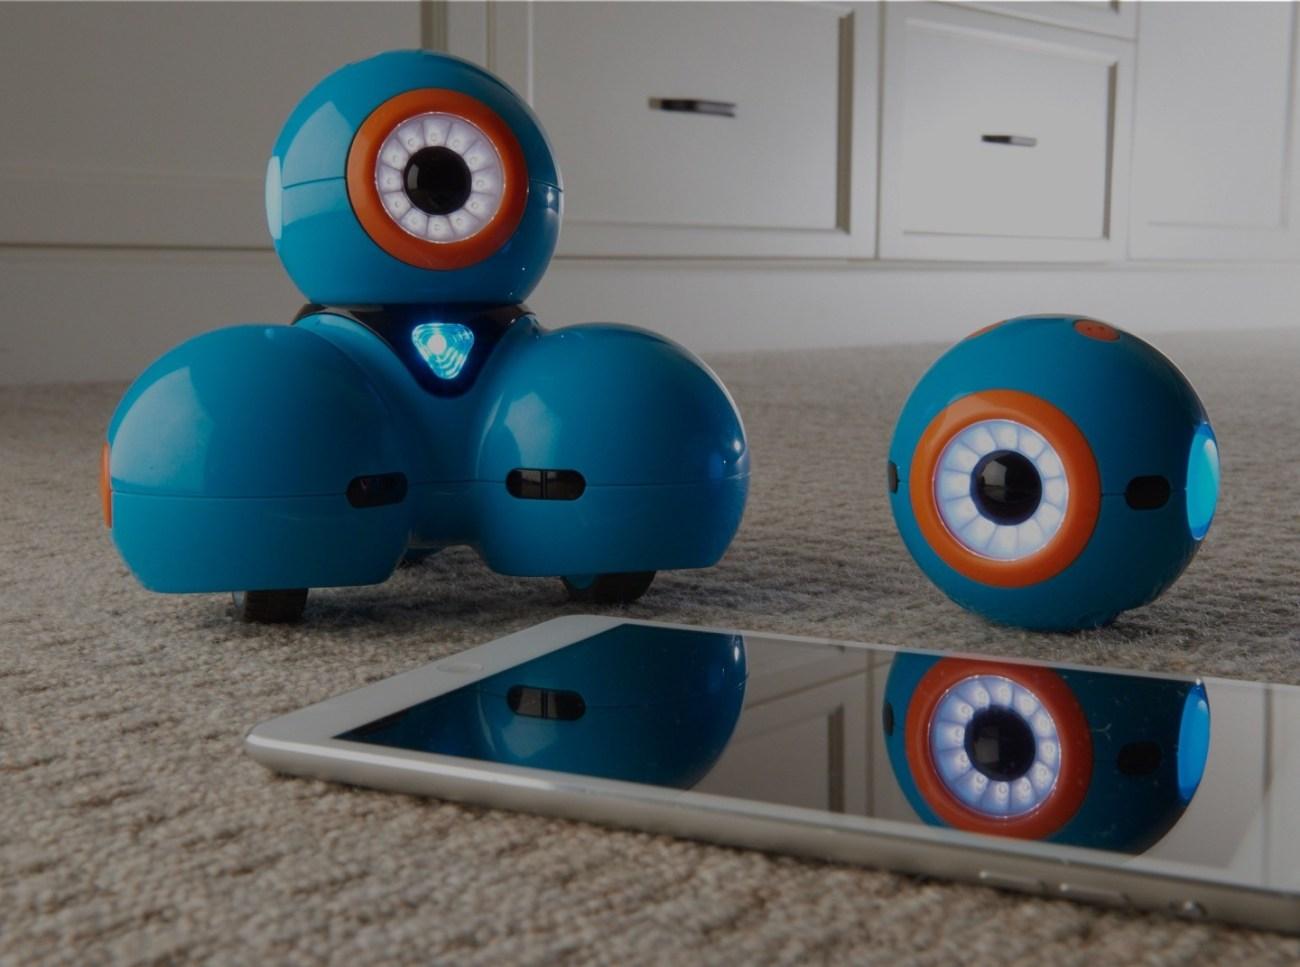 Wonder Workshop, maker of Dash & Bot robots, raised $20 million Series B funding